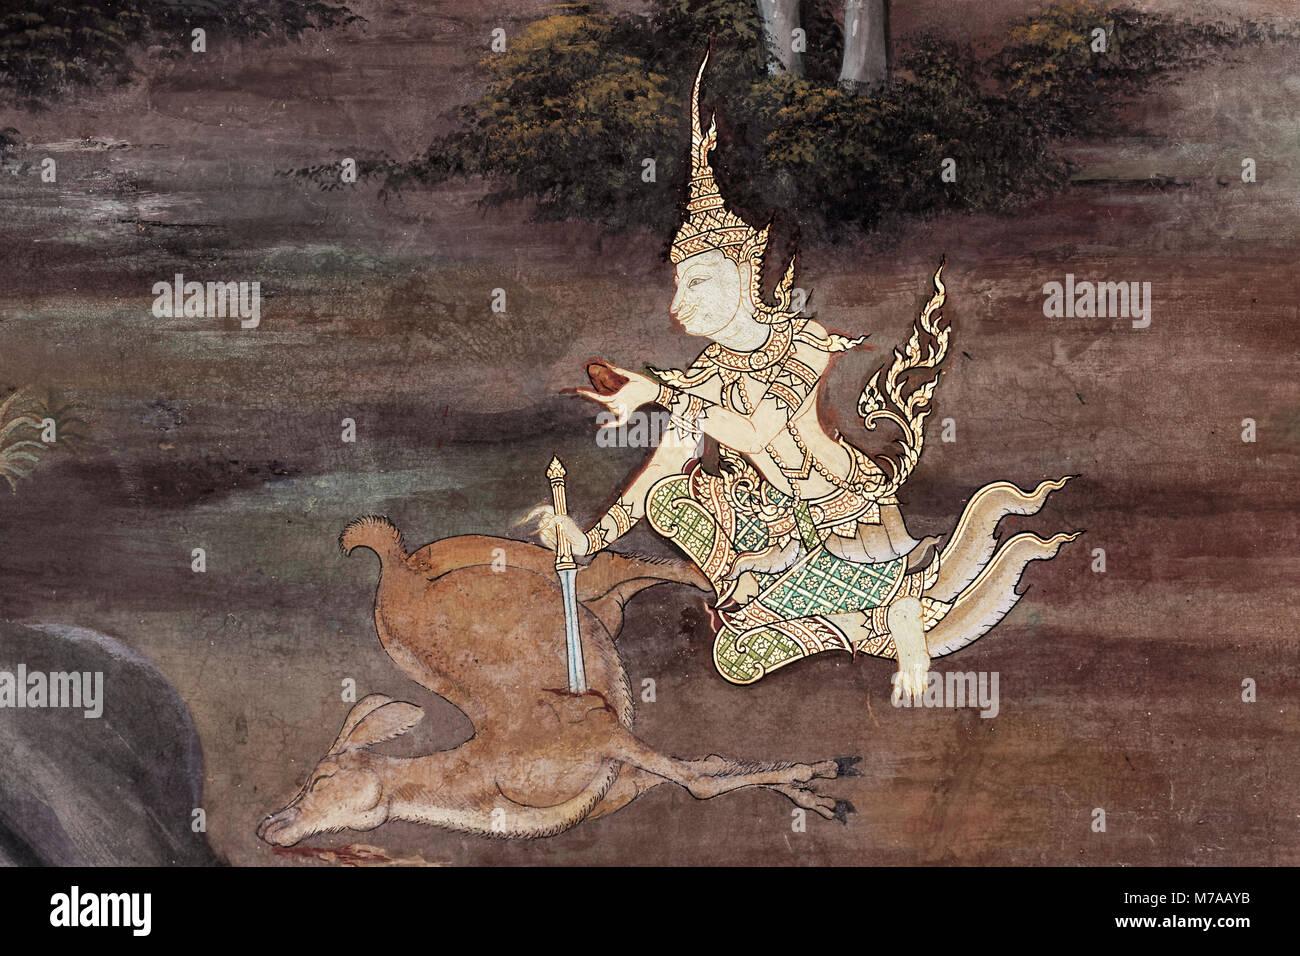 King Rama takes the heart from a killed deer, scene from Ramakia, walls in Wat Phra Kaeo, Ko Ratanakosin, Bangkok, - Stock Image